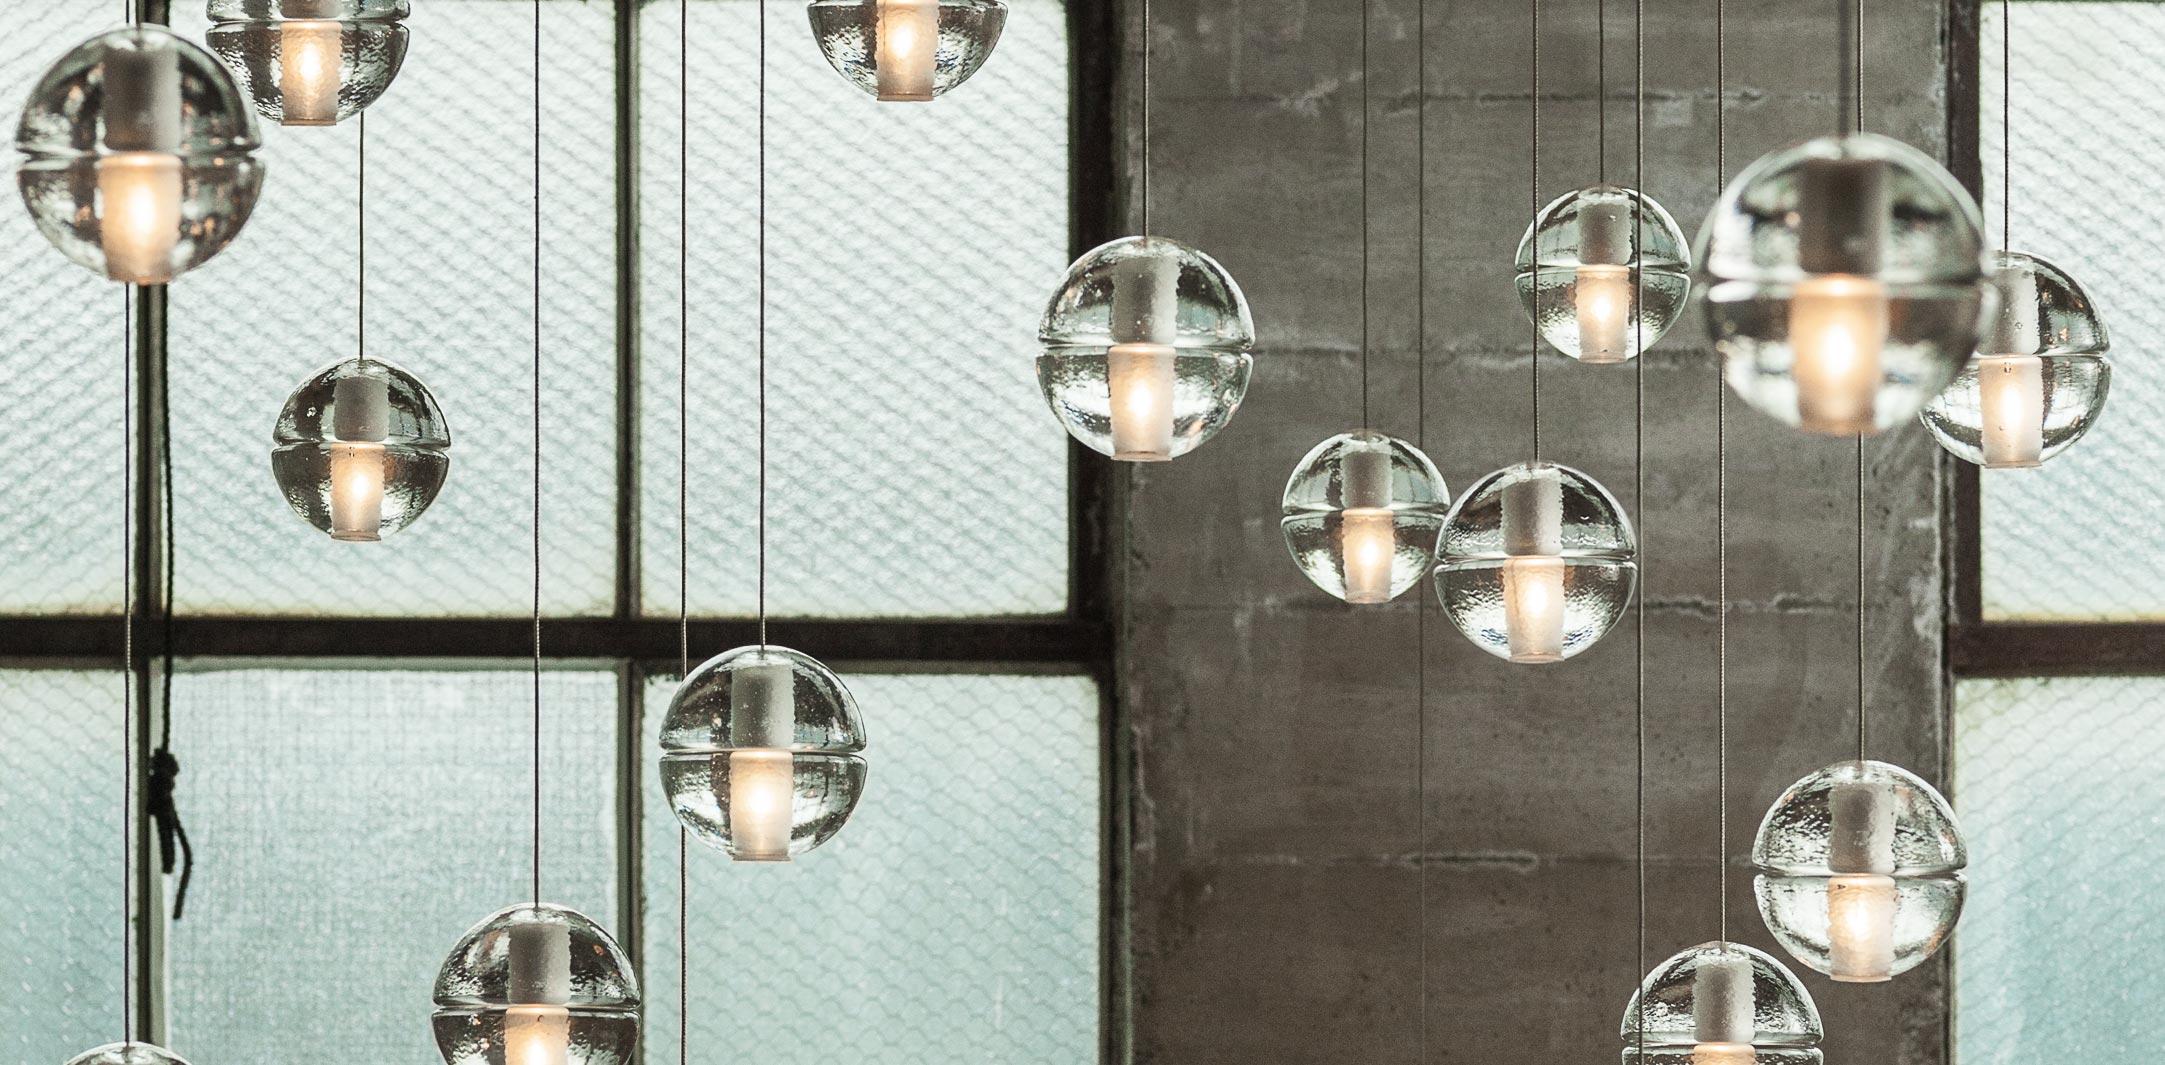 bocci design leuchten serie 14 bruno wickart blog. Black Bedroom Furniture Sets. Home Design Ideas